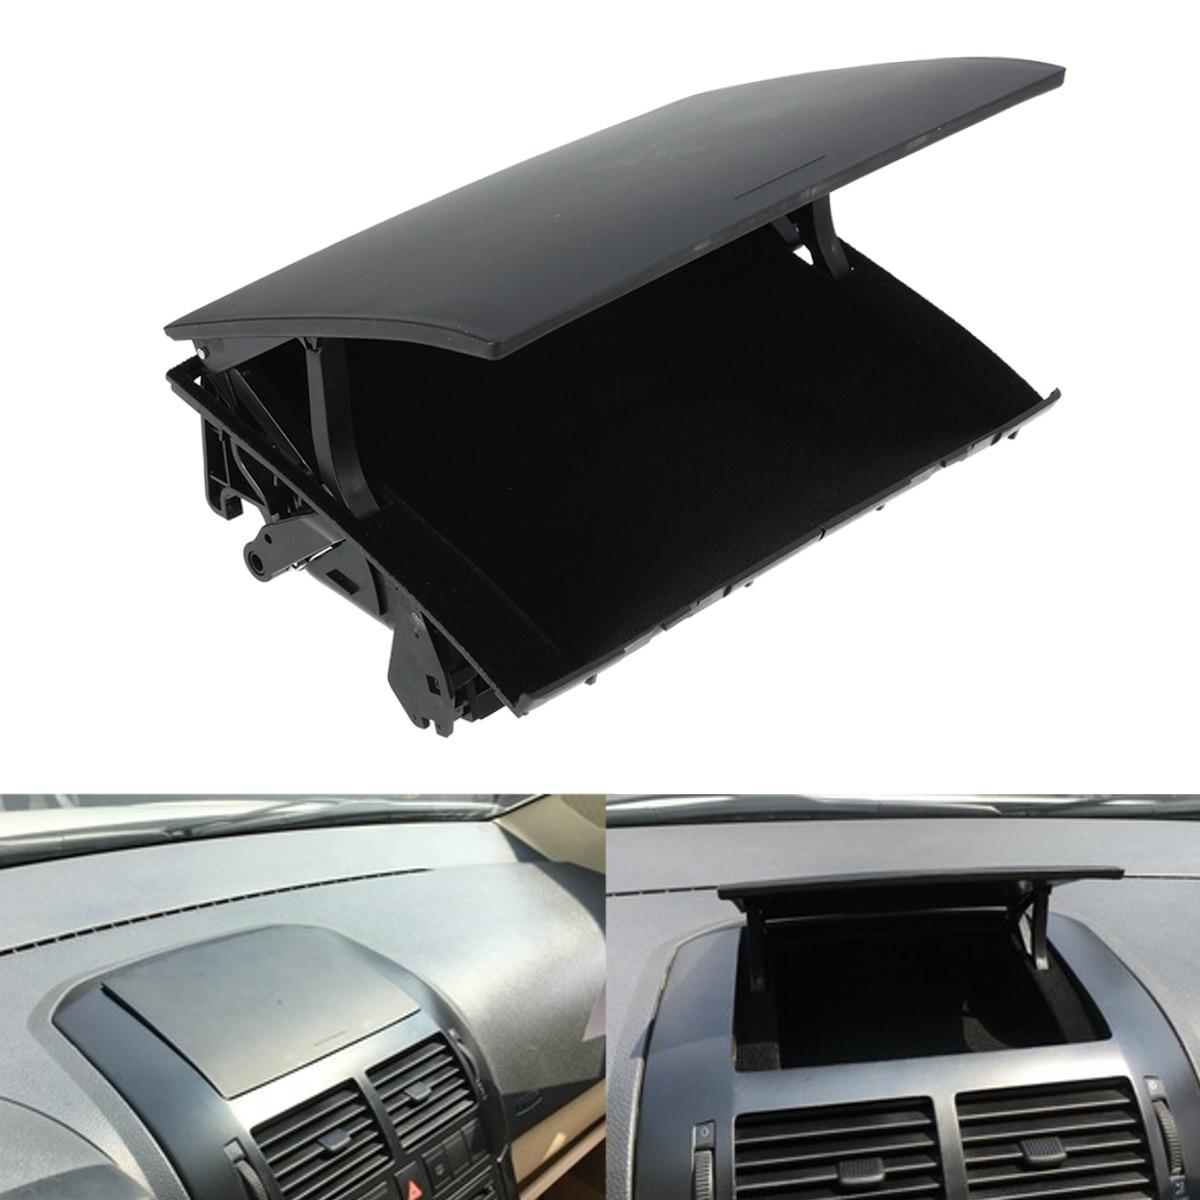 Black Car Front Center Console Dashboard Storage Box Holder Organizer For VW Polo 2002 2003 2004 2005-2008 6Q0857465A 6Q0857465